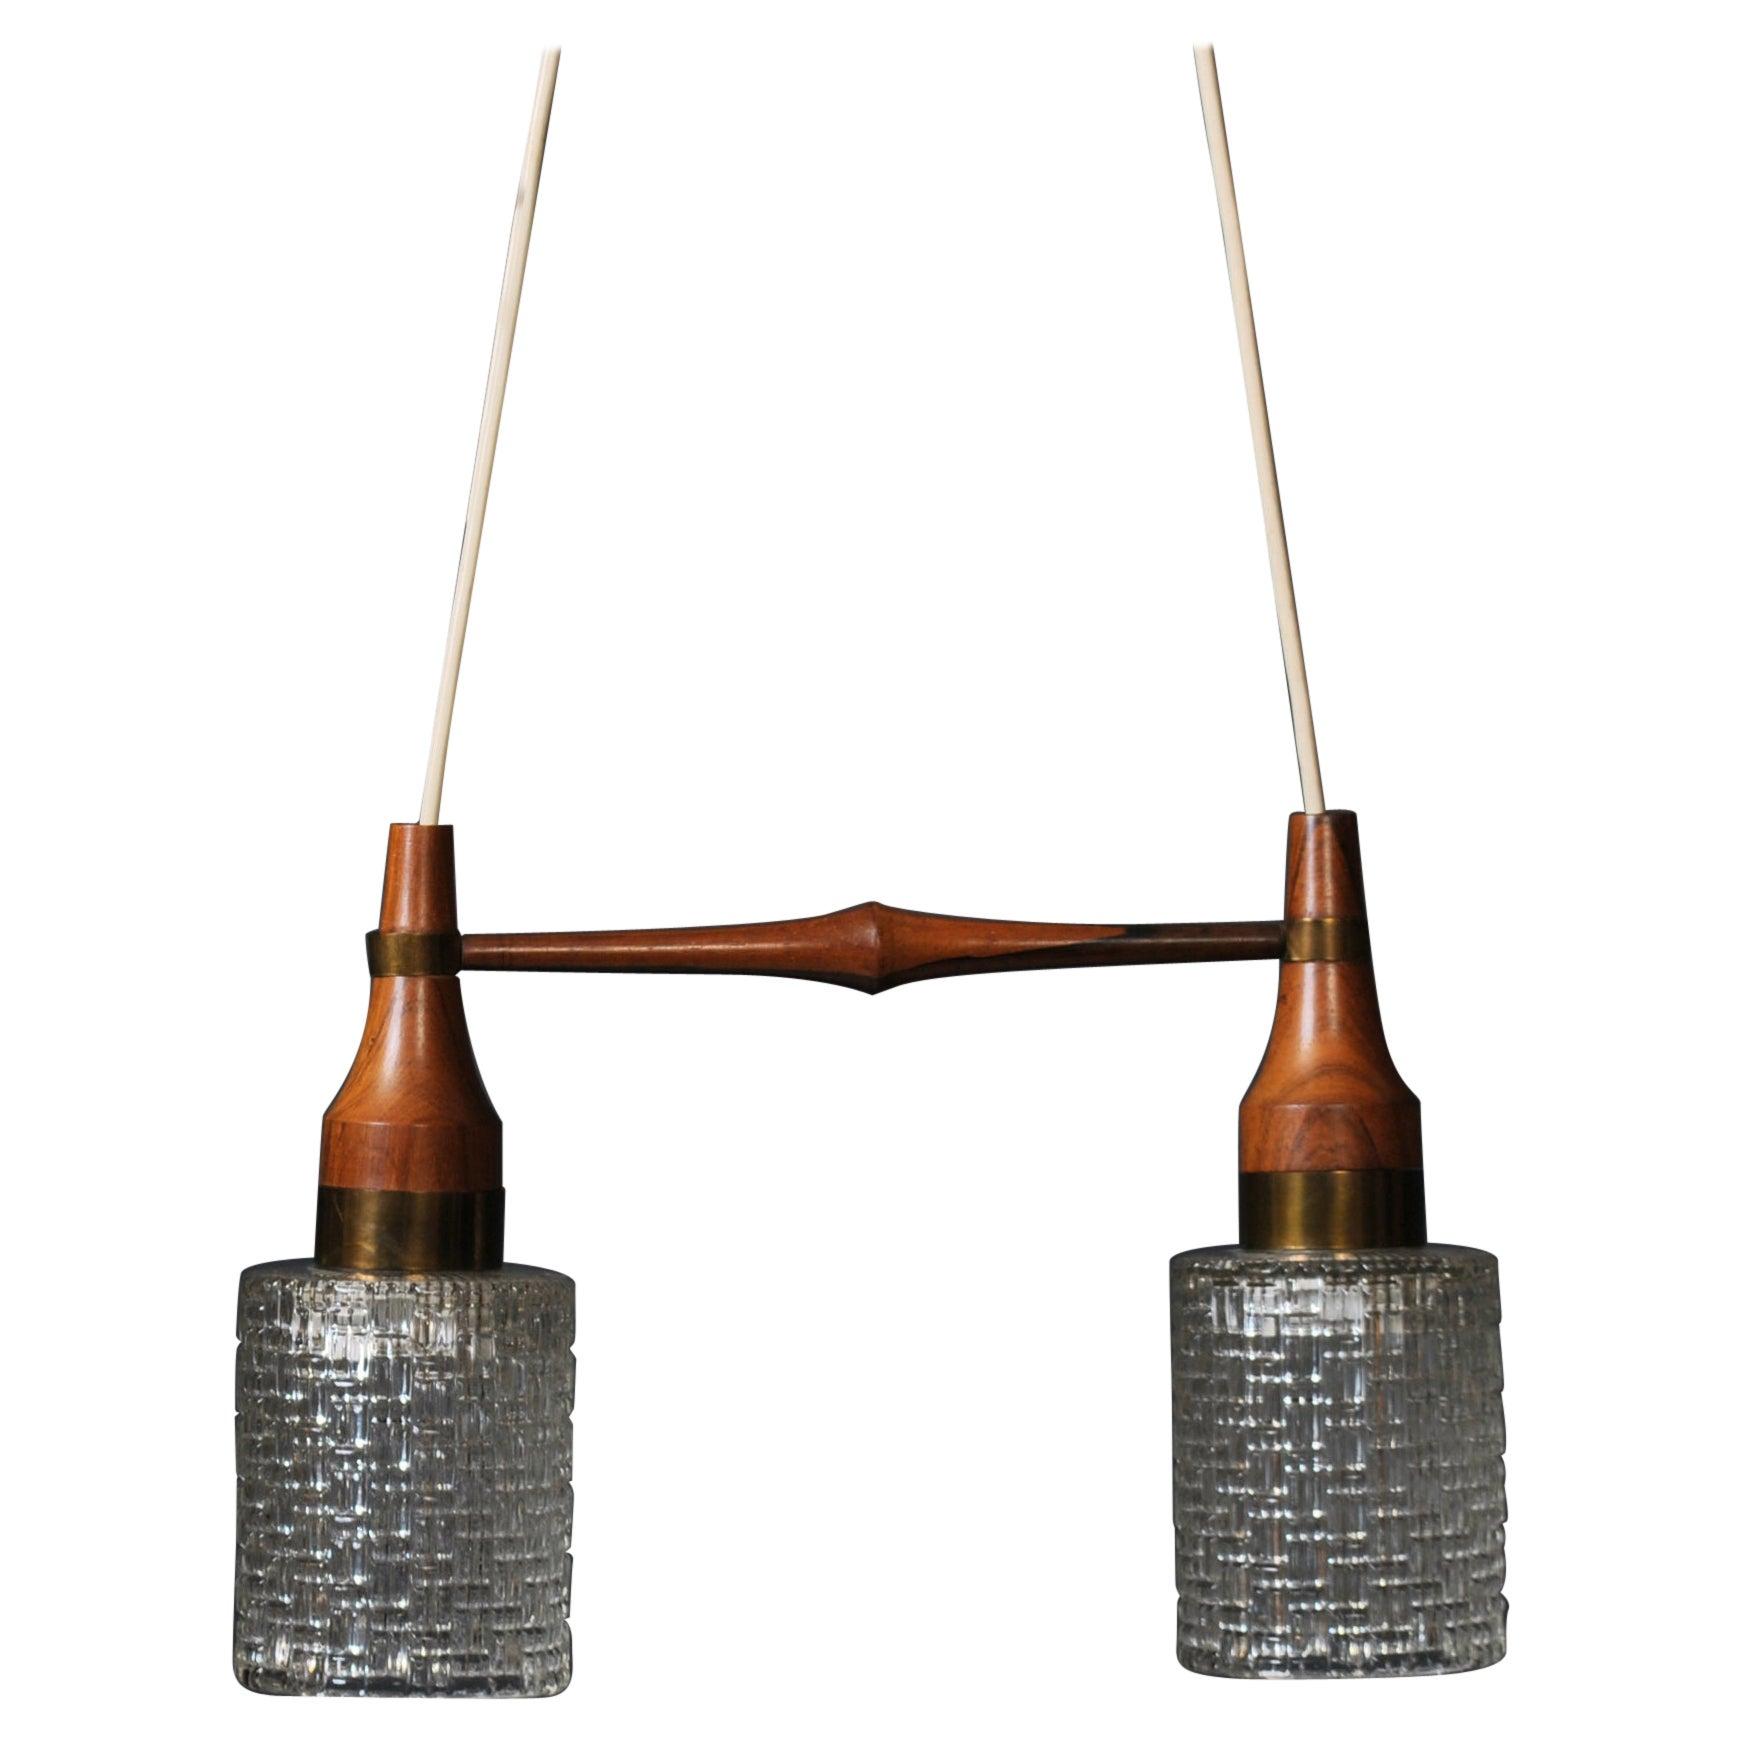 Danish Midcentury Dual Pendant Light